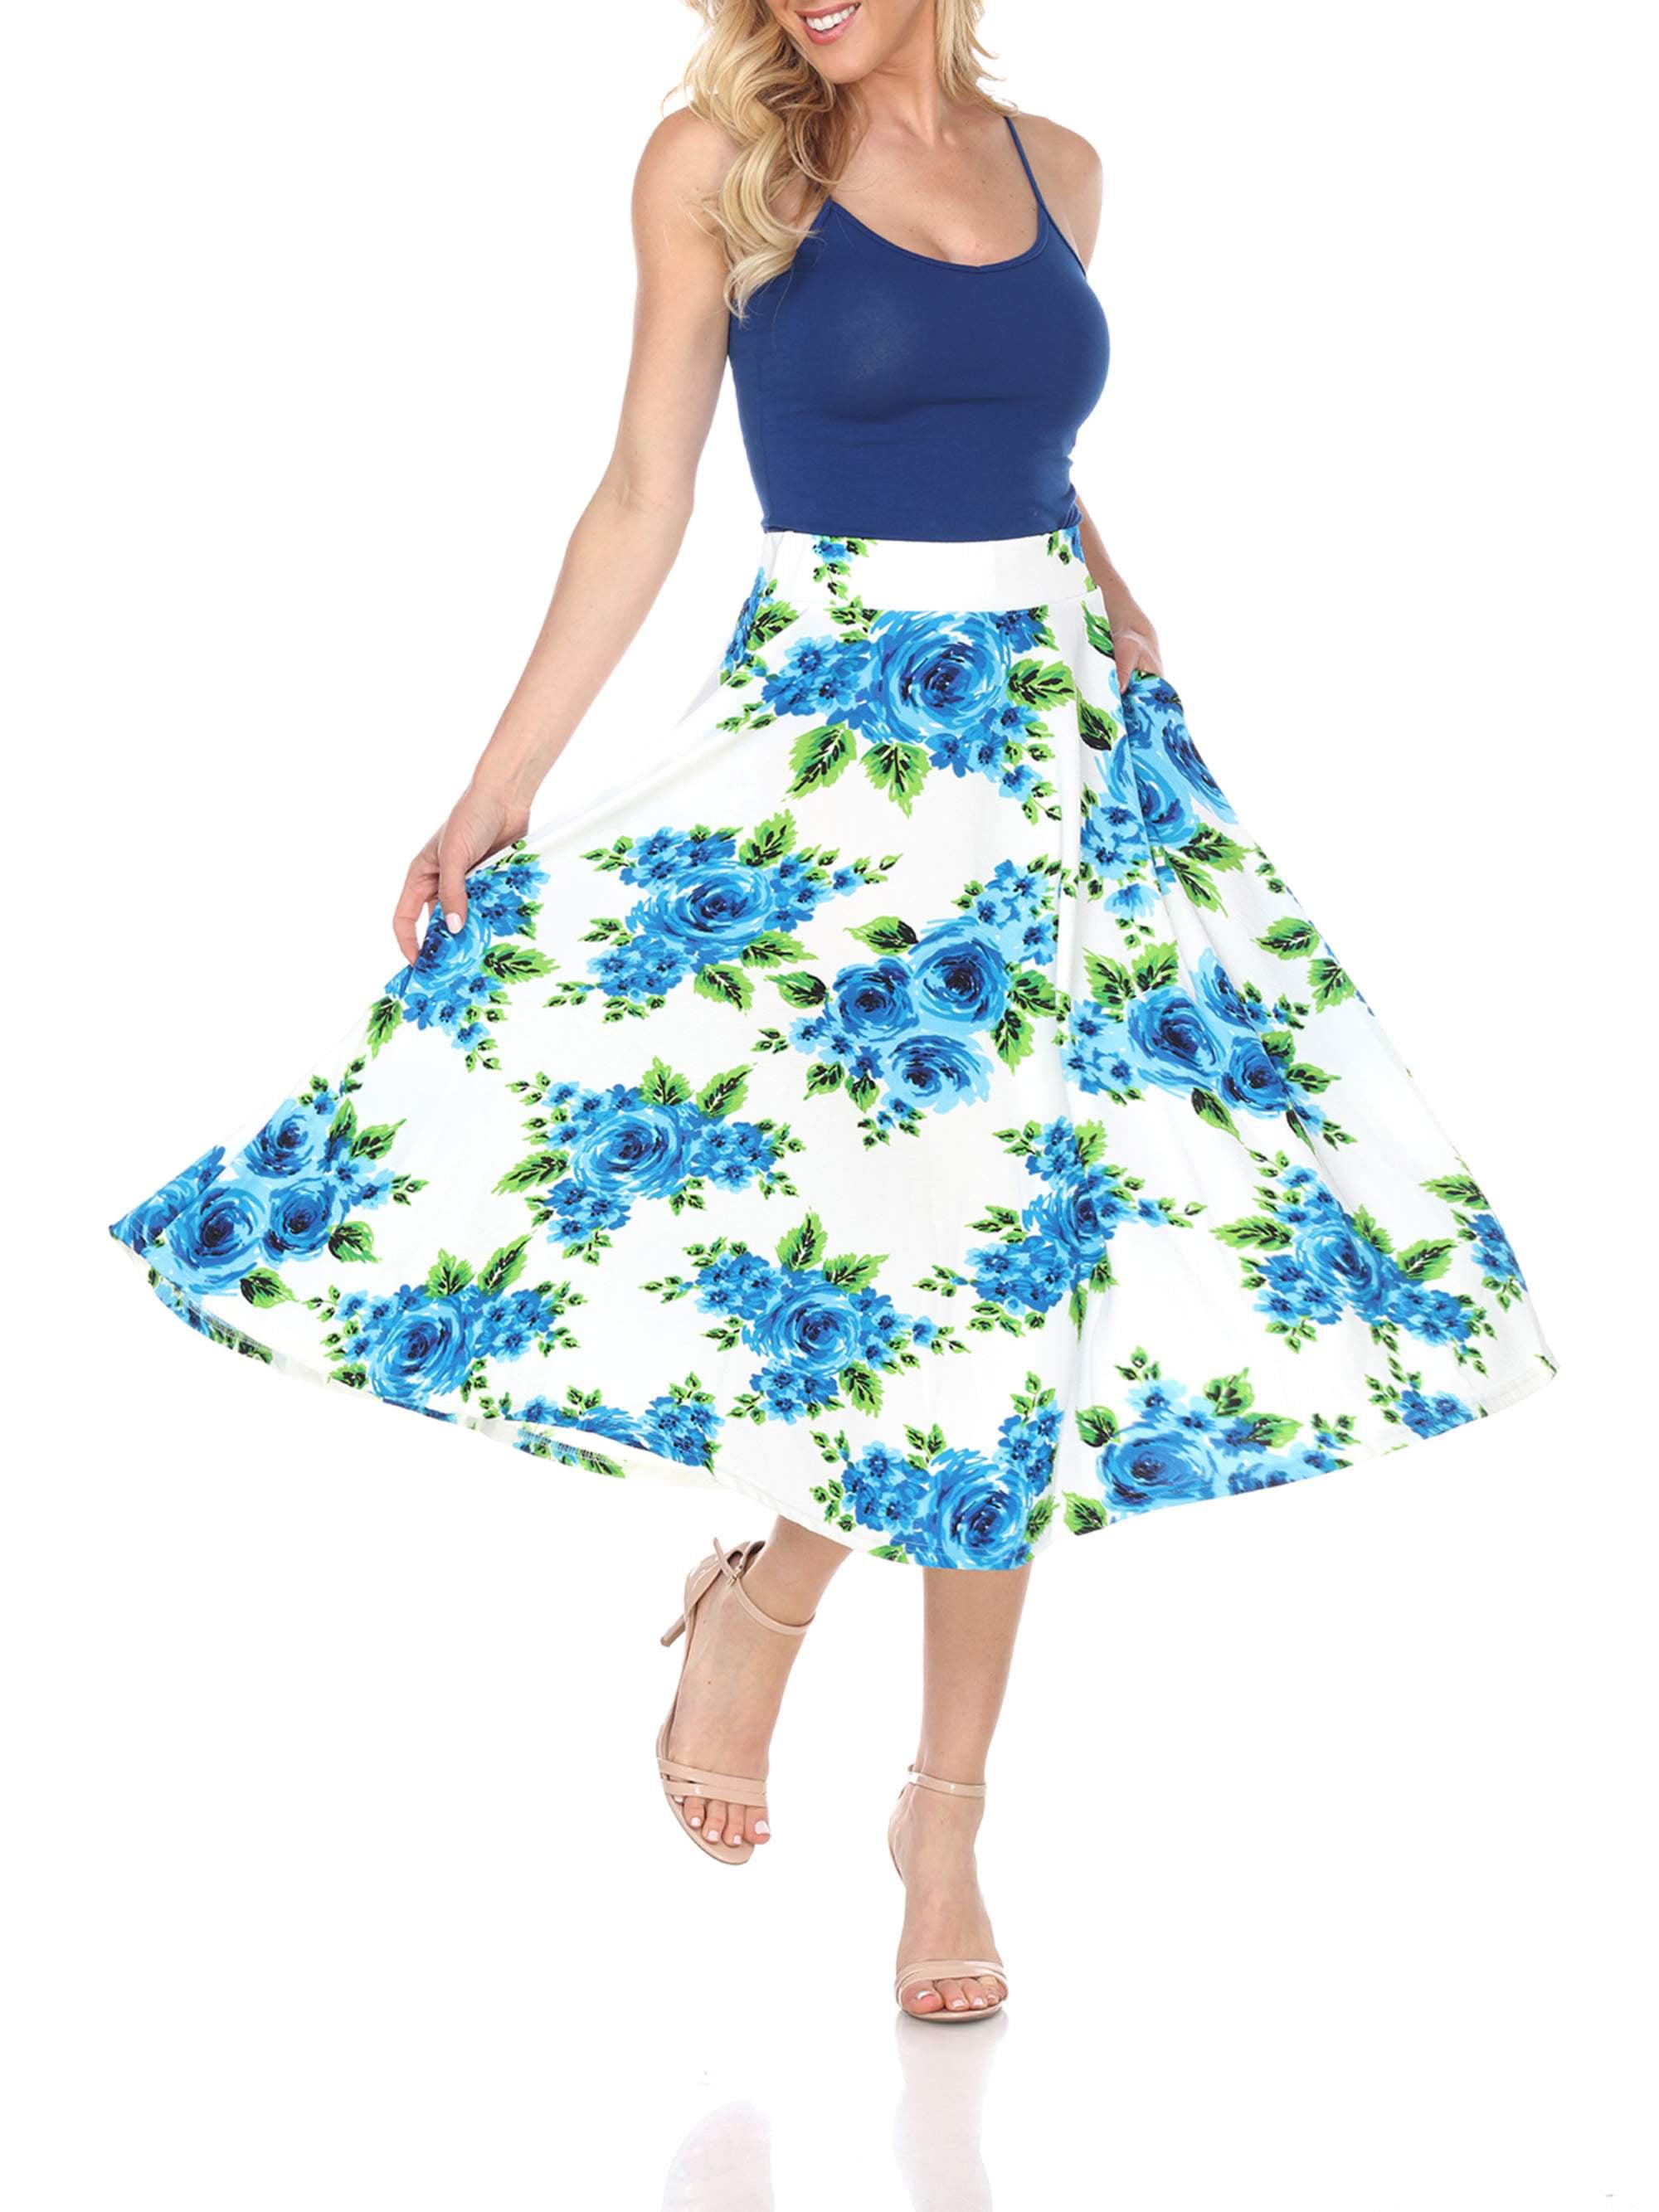 Women's Floral Printed Midi Skirt